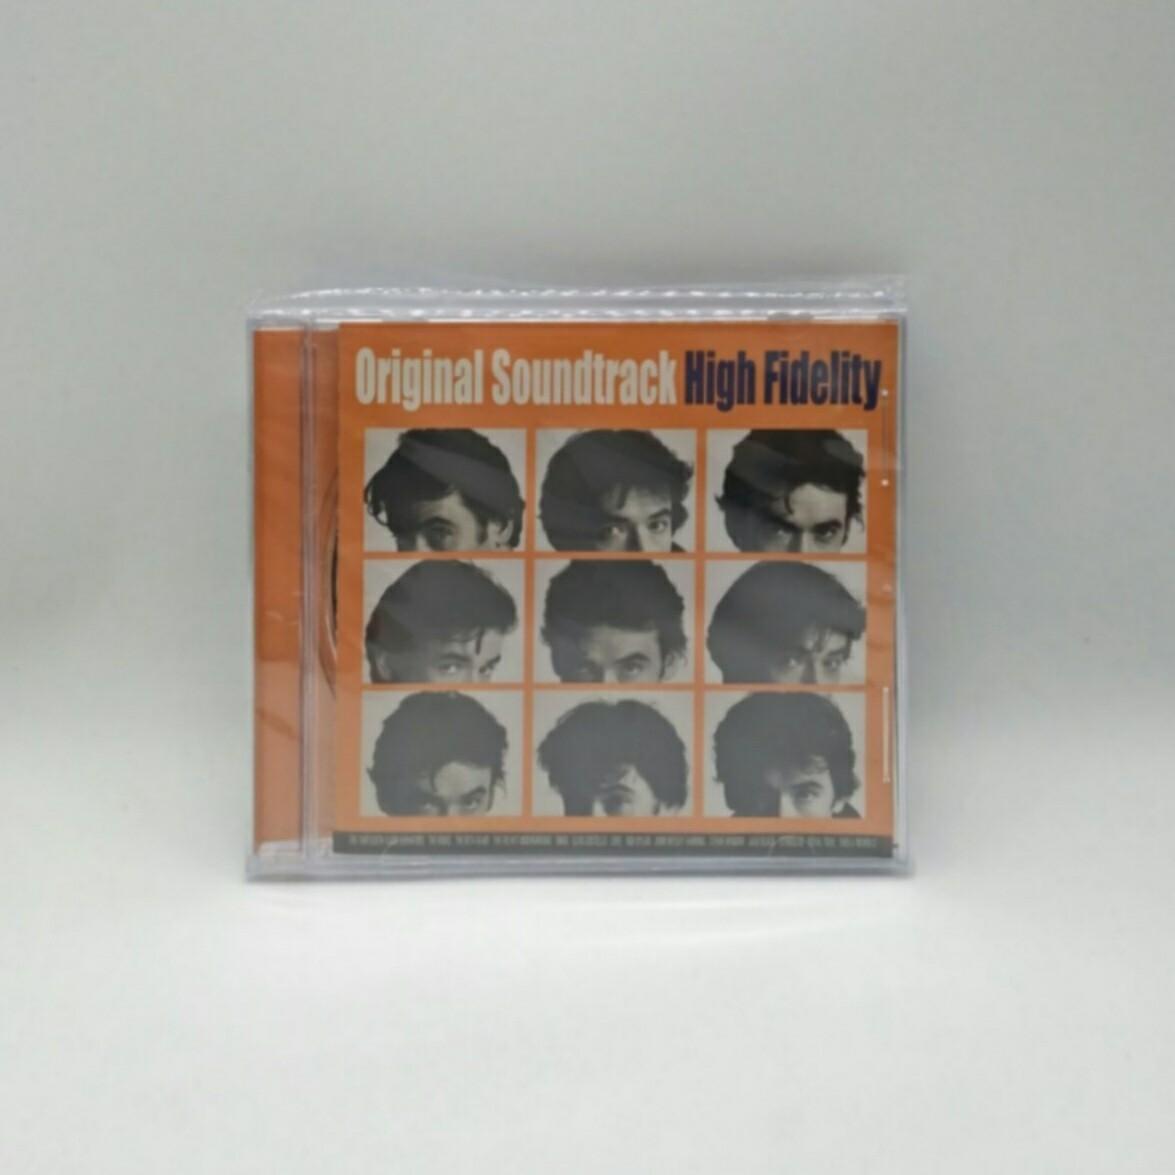 [USED] OST -HIGH FIDELITY ORIGINAL SOUNDTRACK- CD